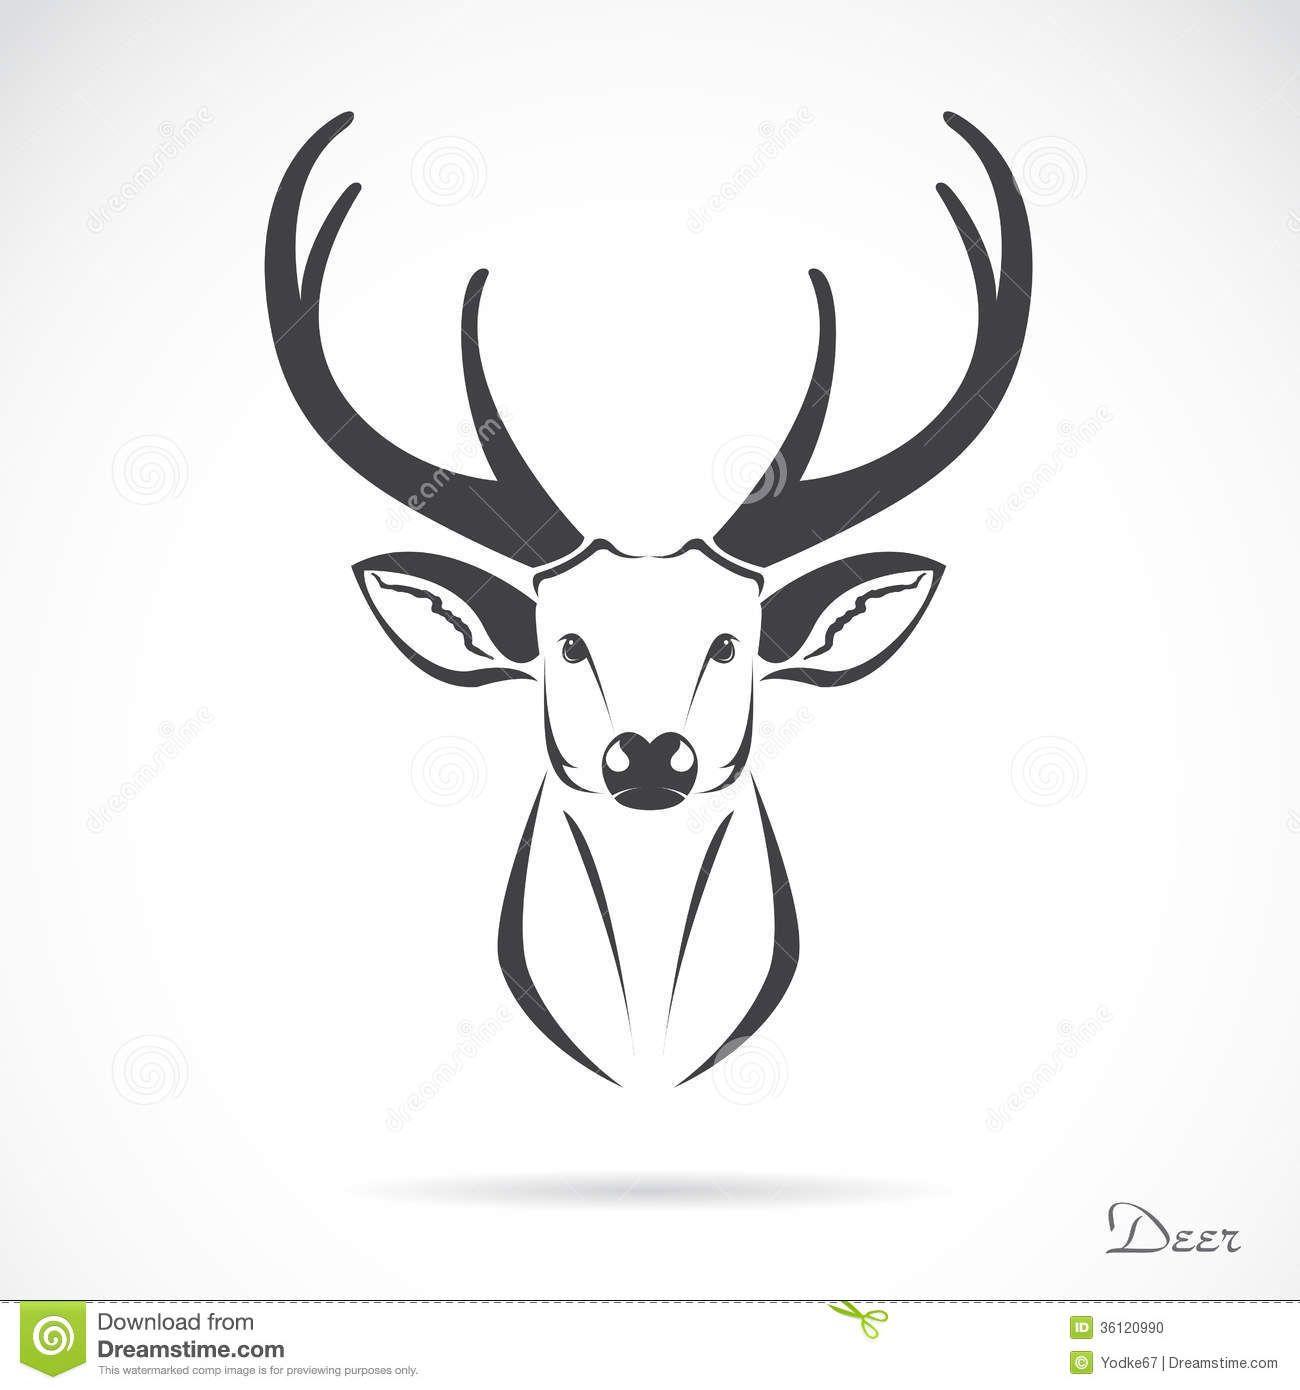 Deer Head Outline Tattoo Vector Image Of An